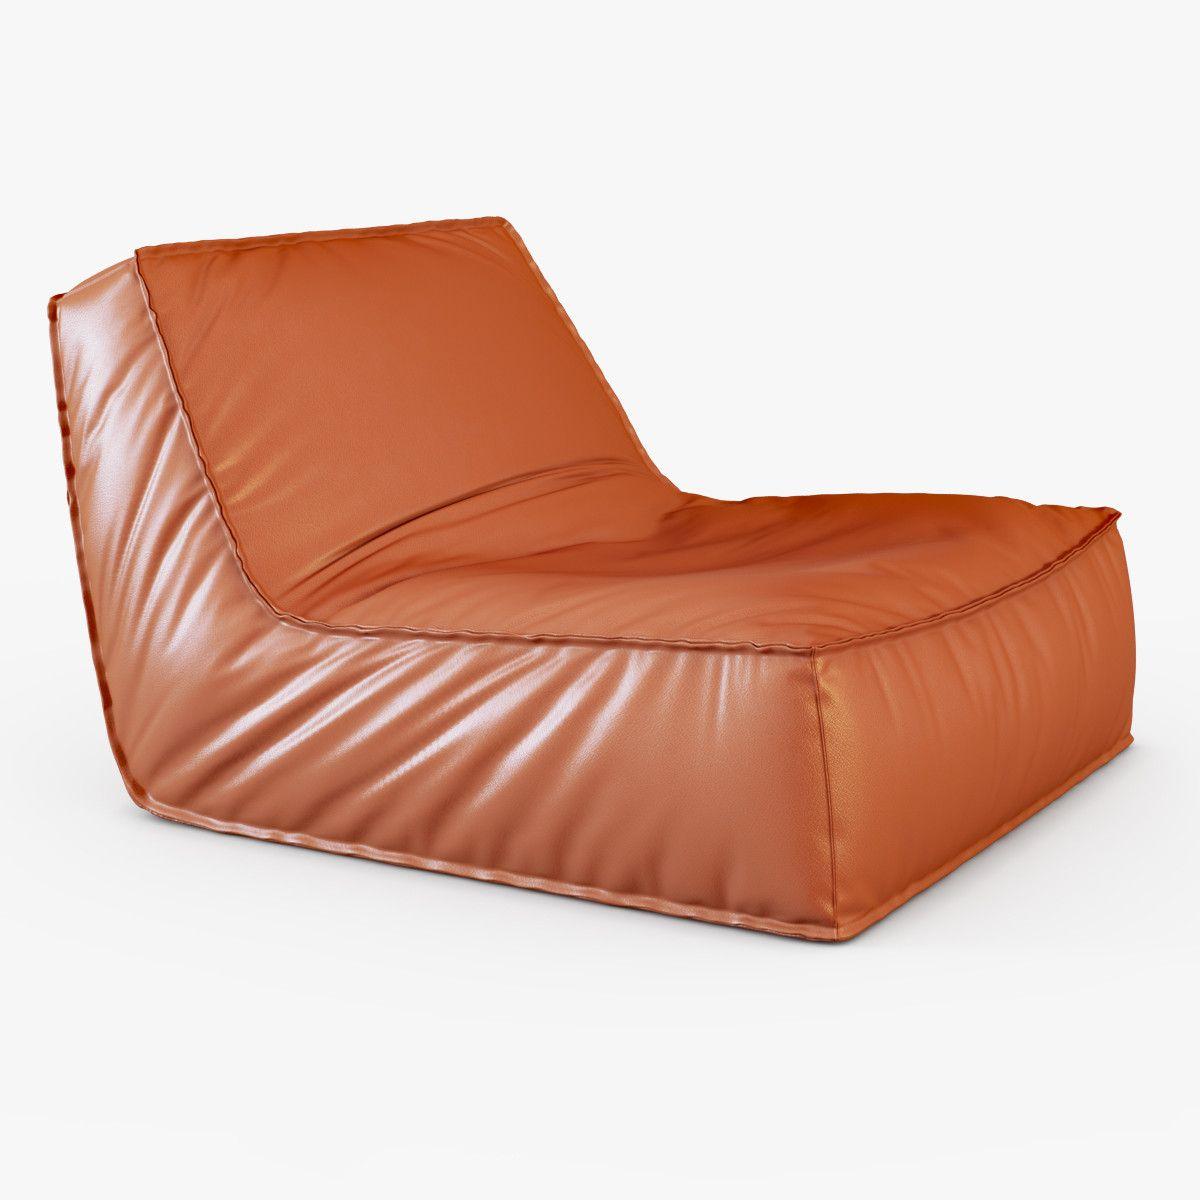 Max zoe lounge chair d model dmodeling pinterest